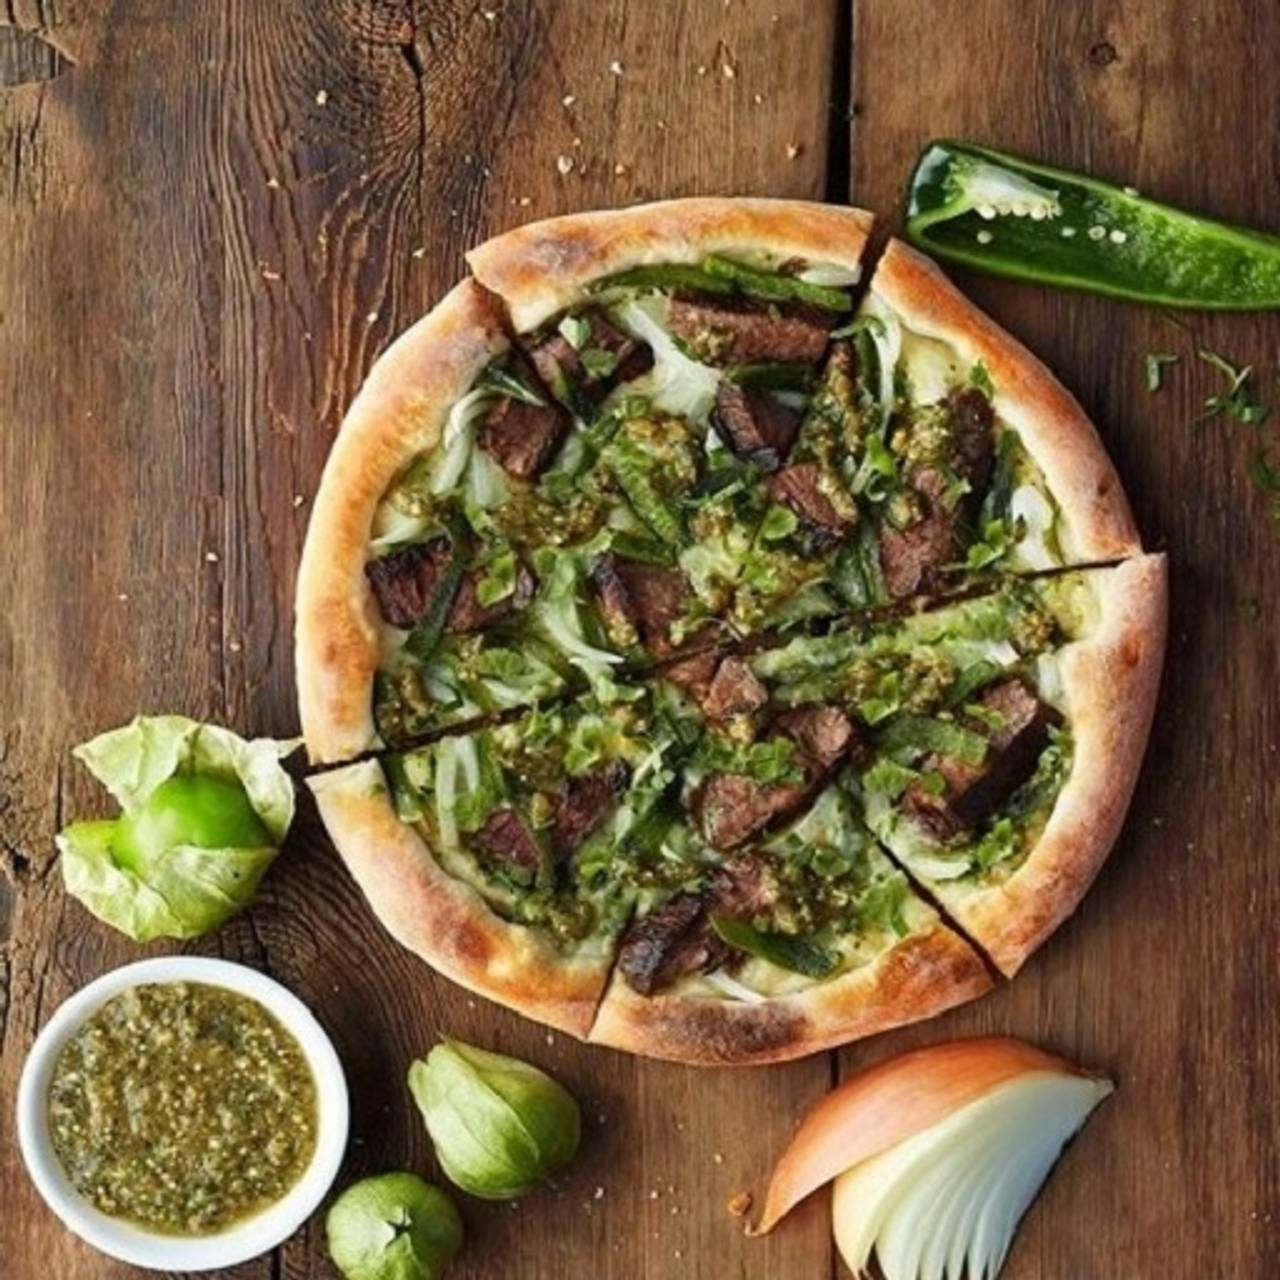 california pizza kitchen alton priority seating restaurant rh opentable com